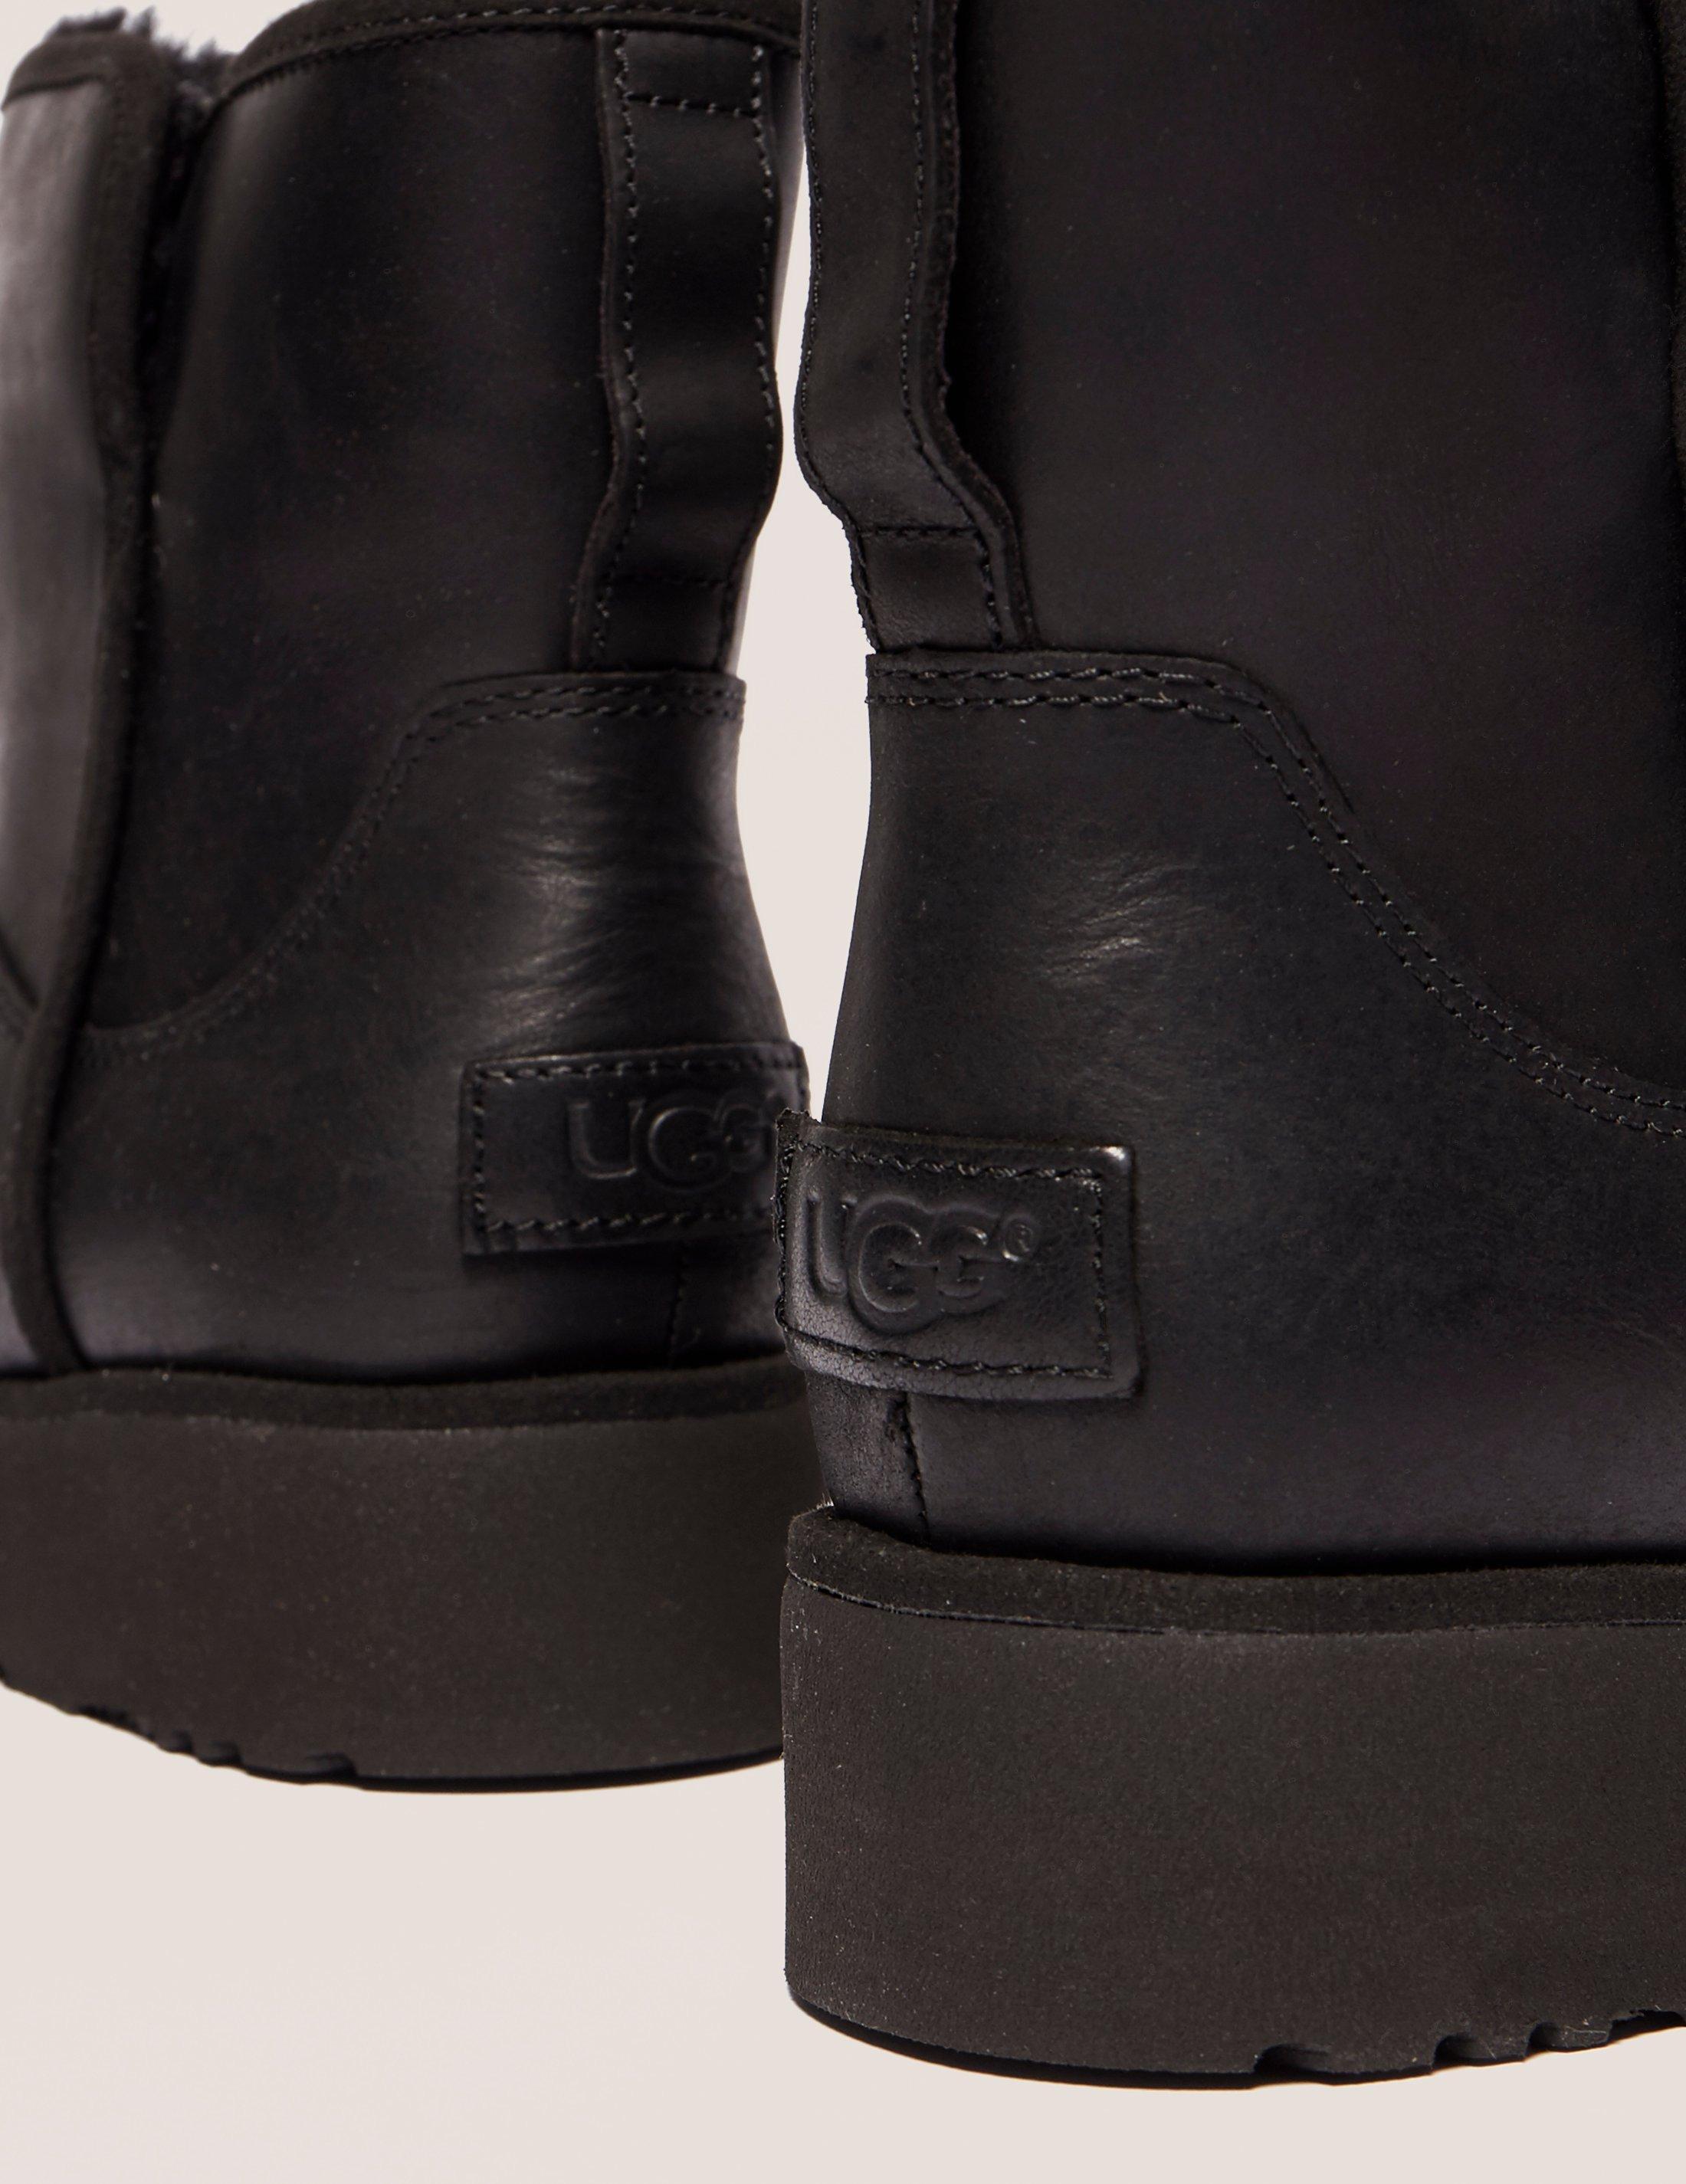 716d0438e77 Ugg Womens Kristin Leather Boot Black